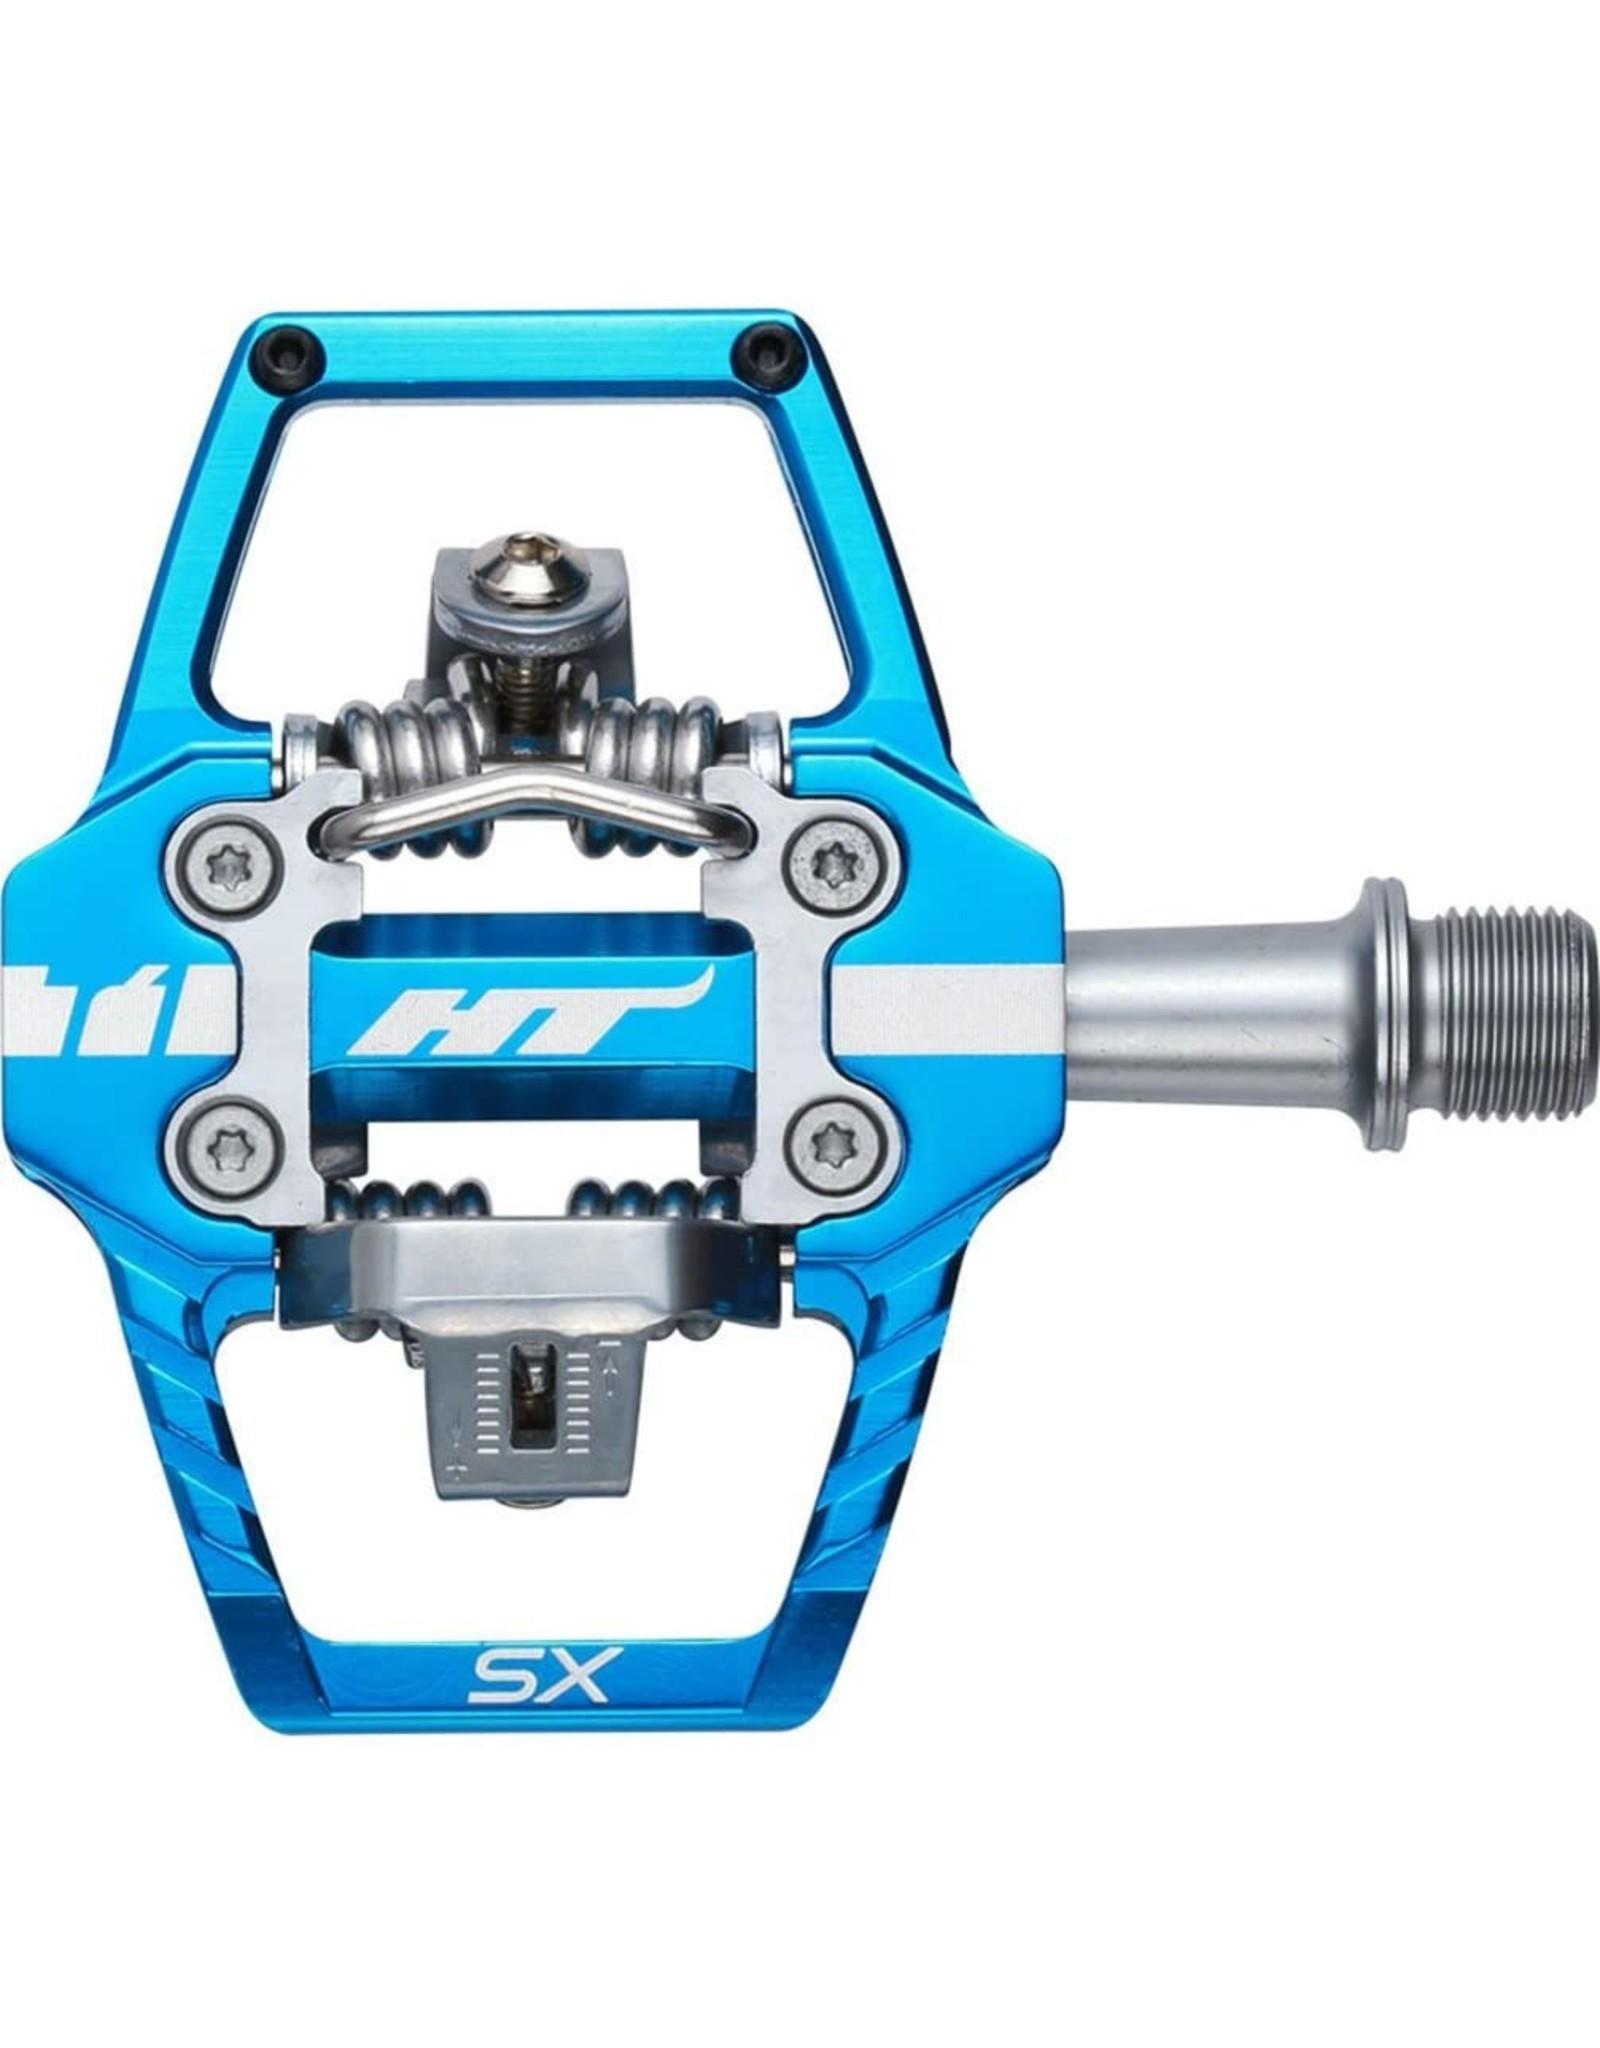 "HT Components HT T1-SX BMX-SX Pedals - Dual Sided Clipless with Platform, Aluminum, 9/16"", Marine Blue"